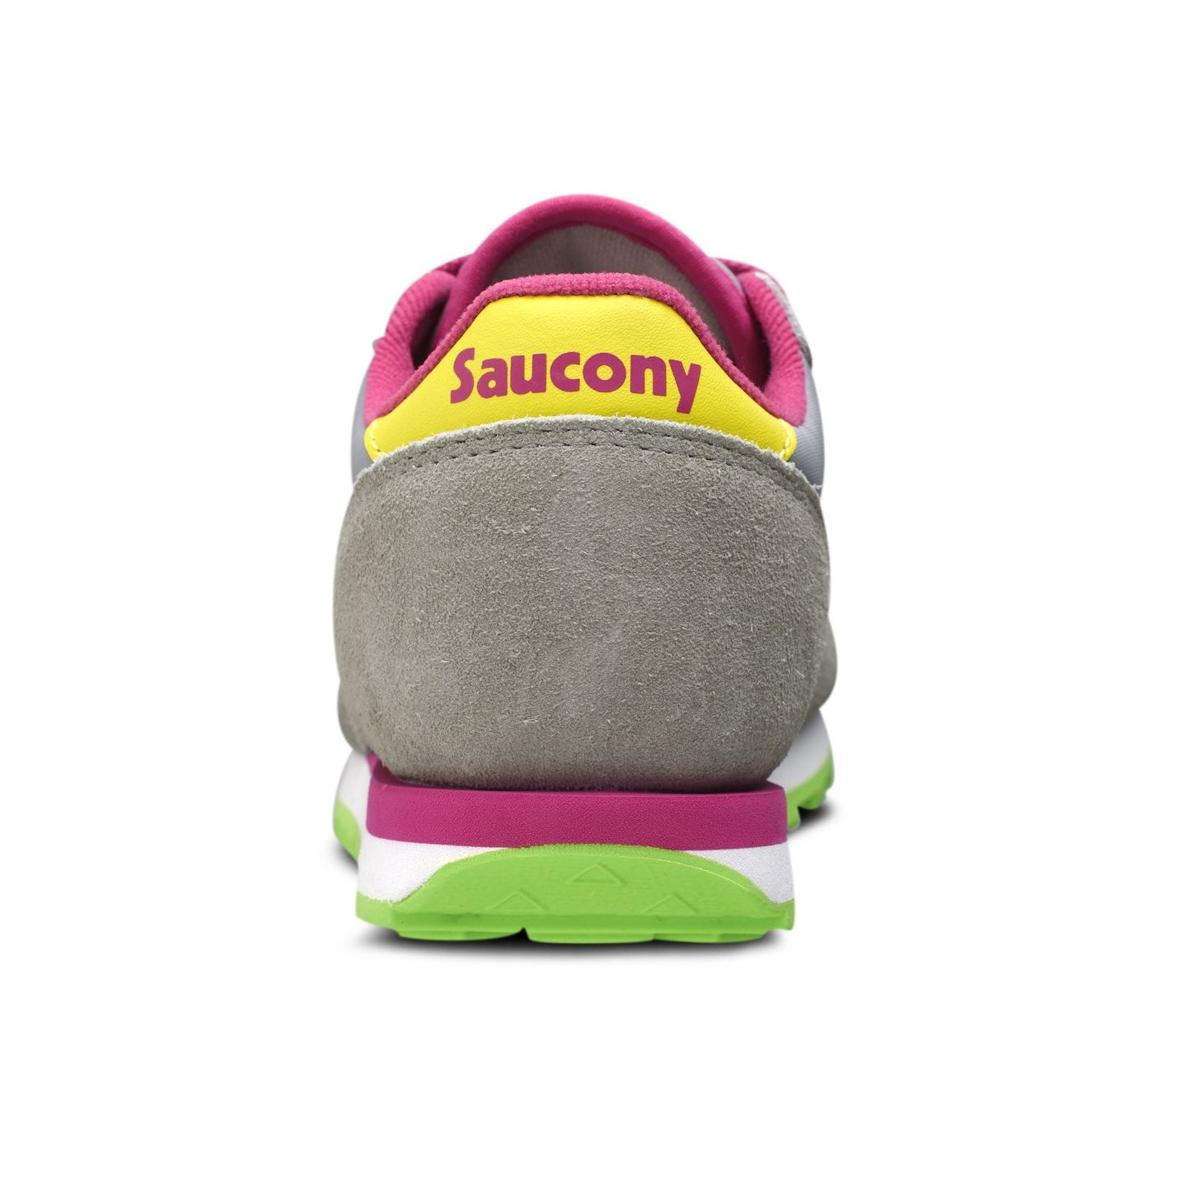 Scarpe Saucony Jazz Original Grey/Yellow Bambino Unisex rif. SK159611Y